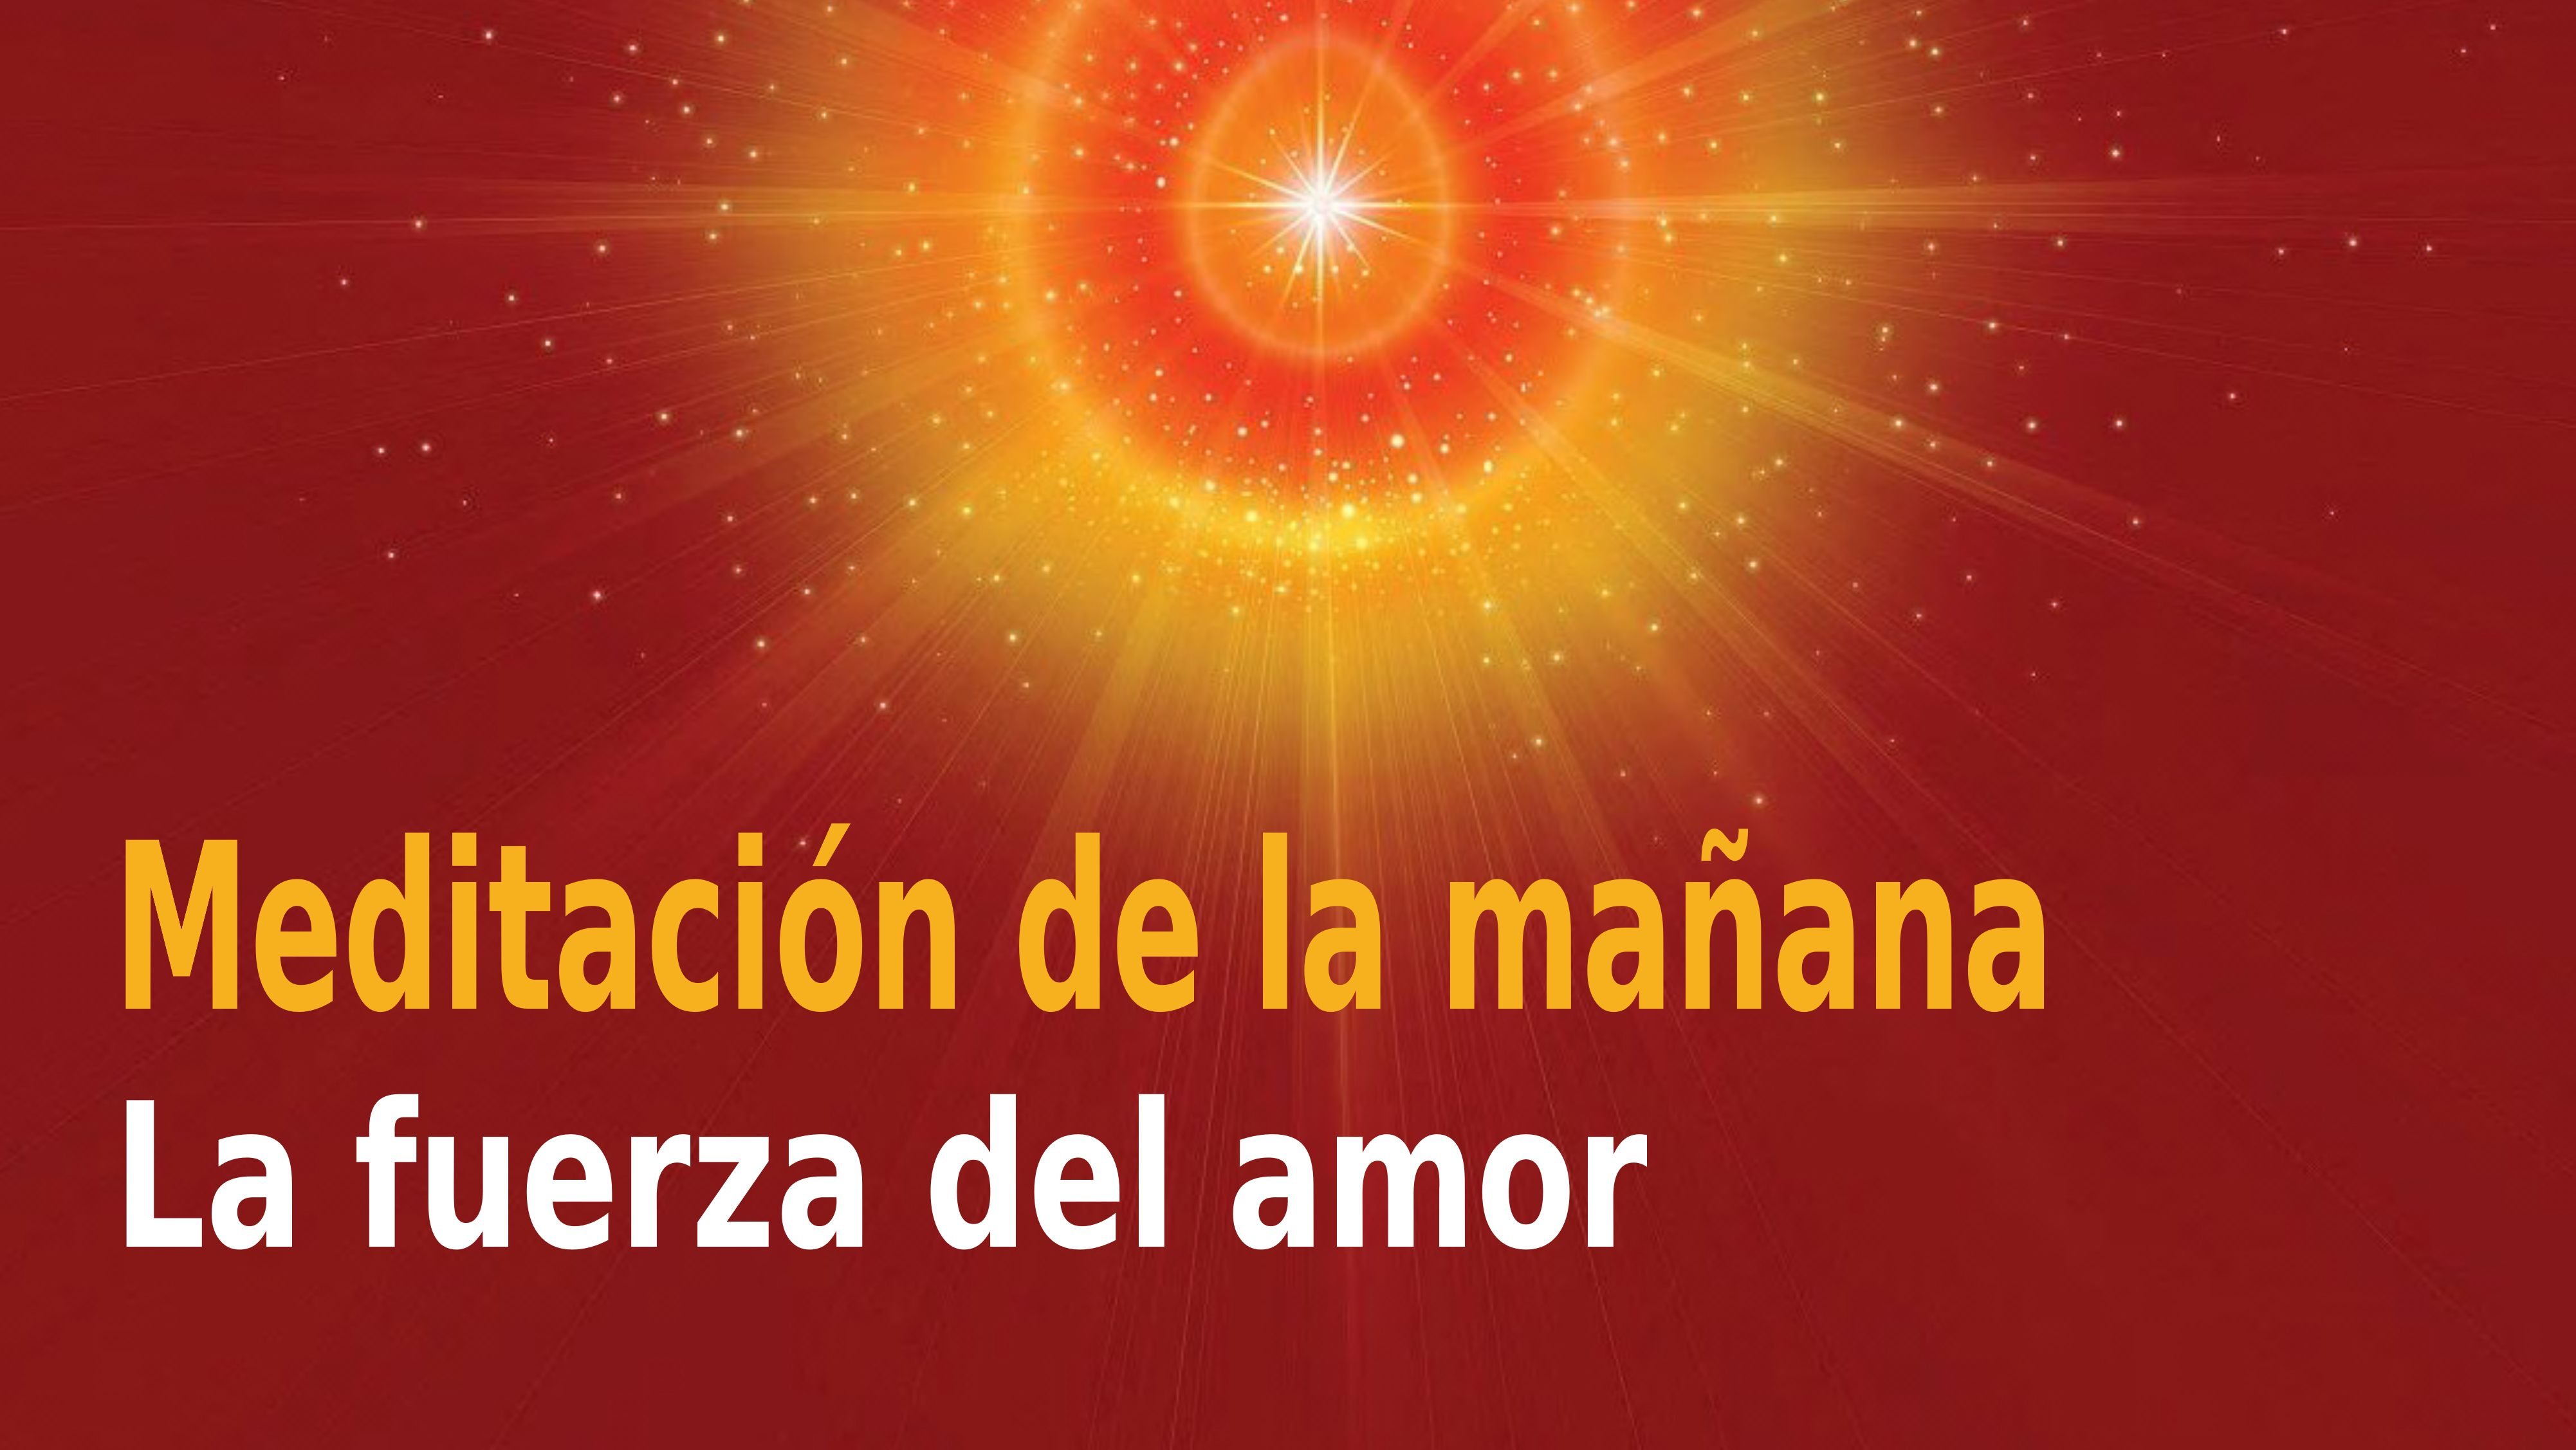 Meditación de la mañana Raja Yoga: La fuerza del amor (30 Octubre 2020)